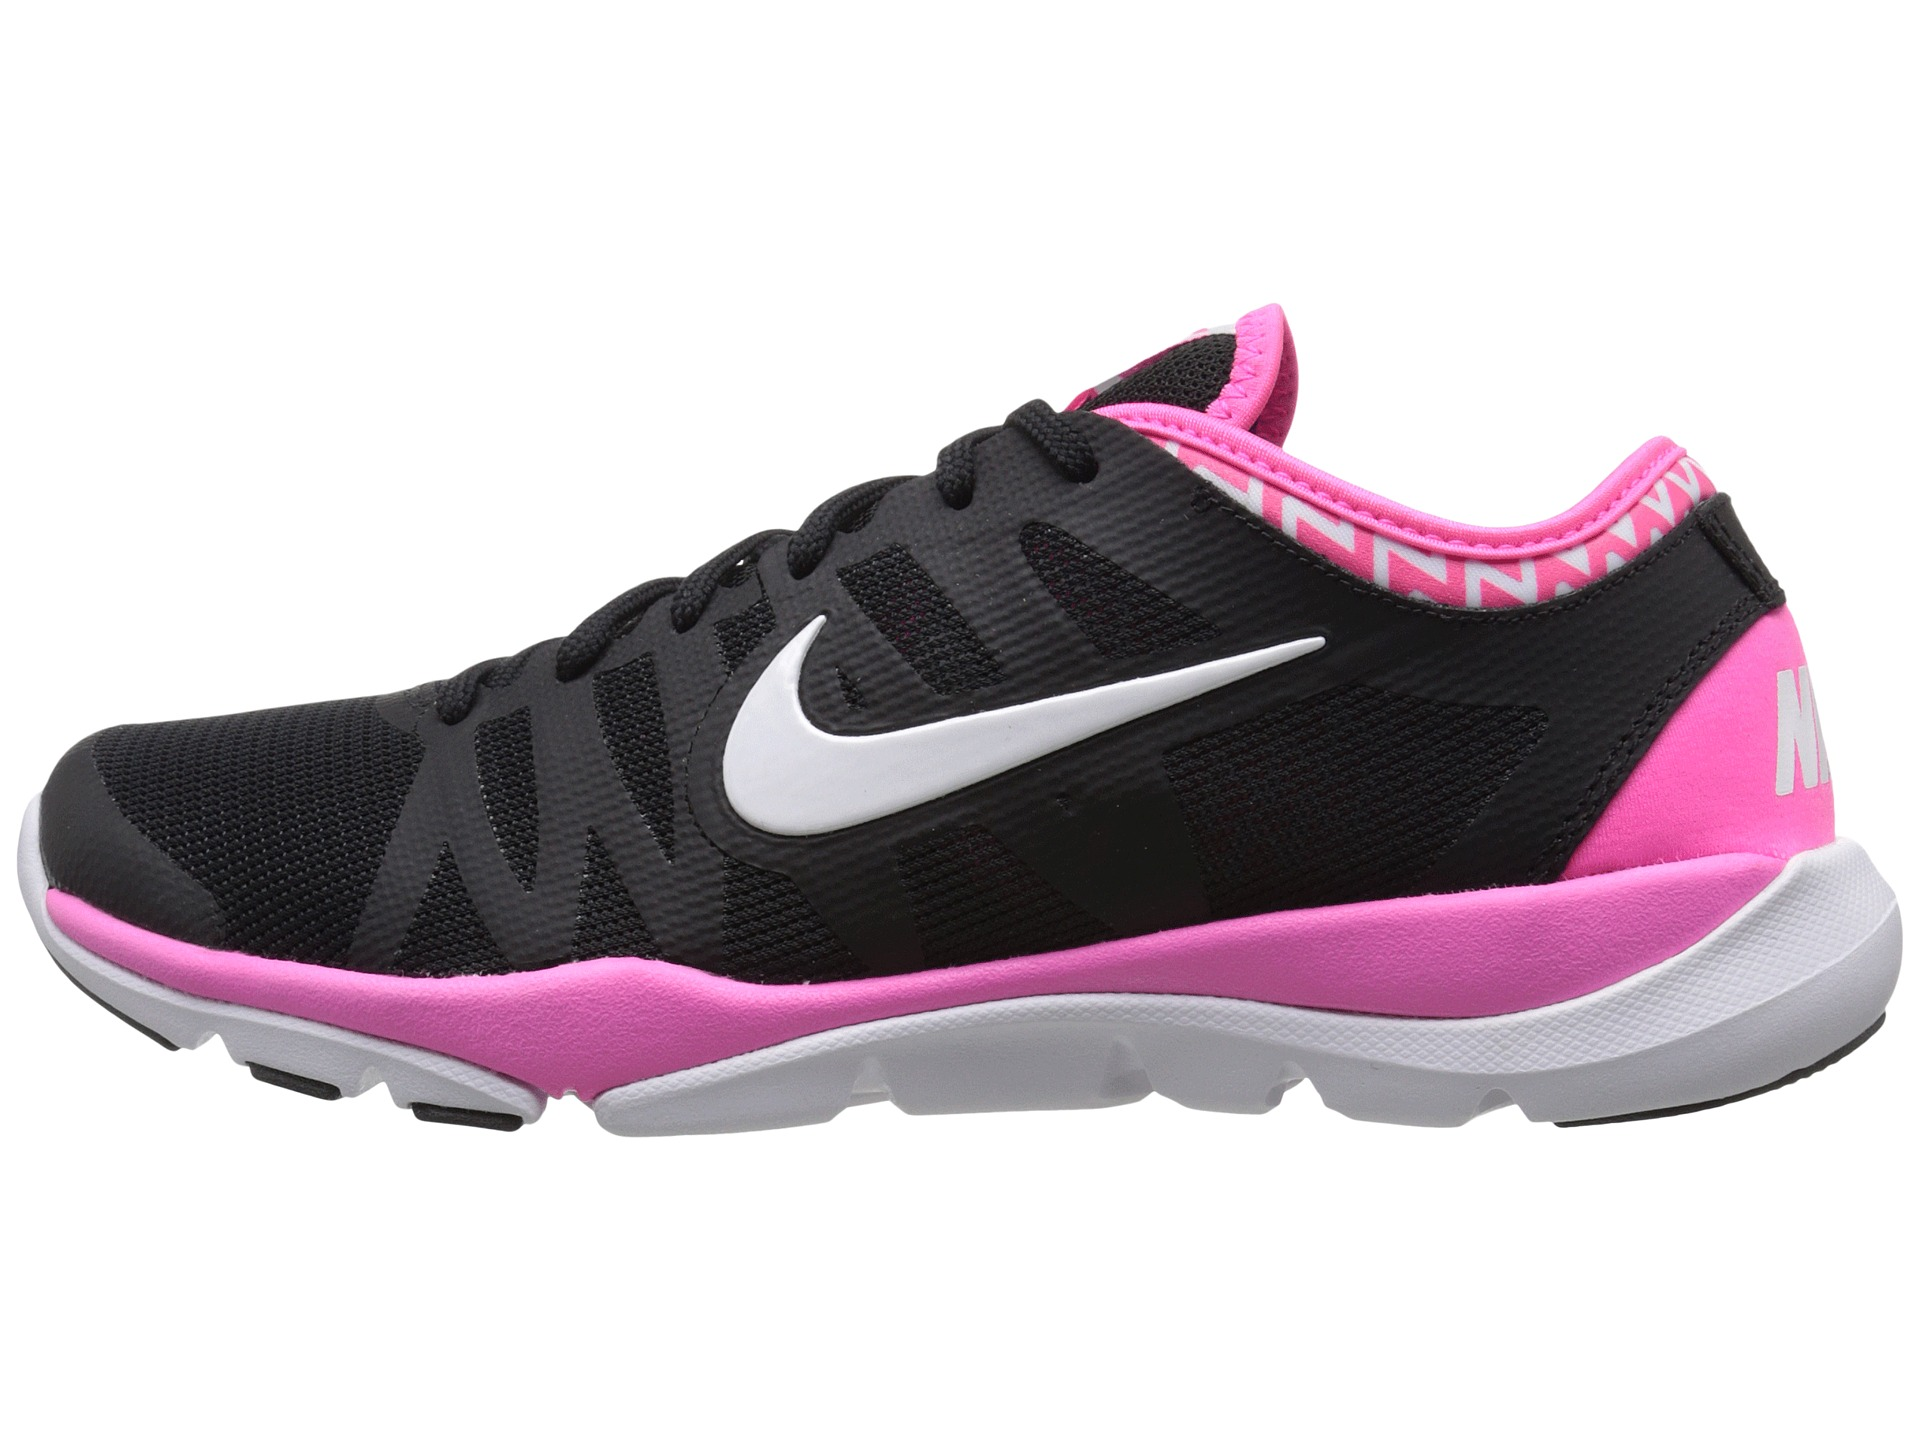 7ac010cae Rocky S2v Vs Nike Sfb 6c Girl Shoes